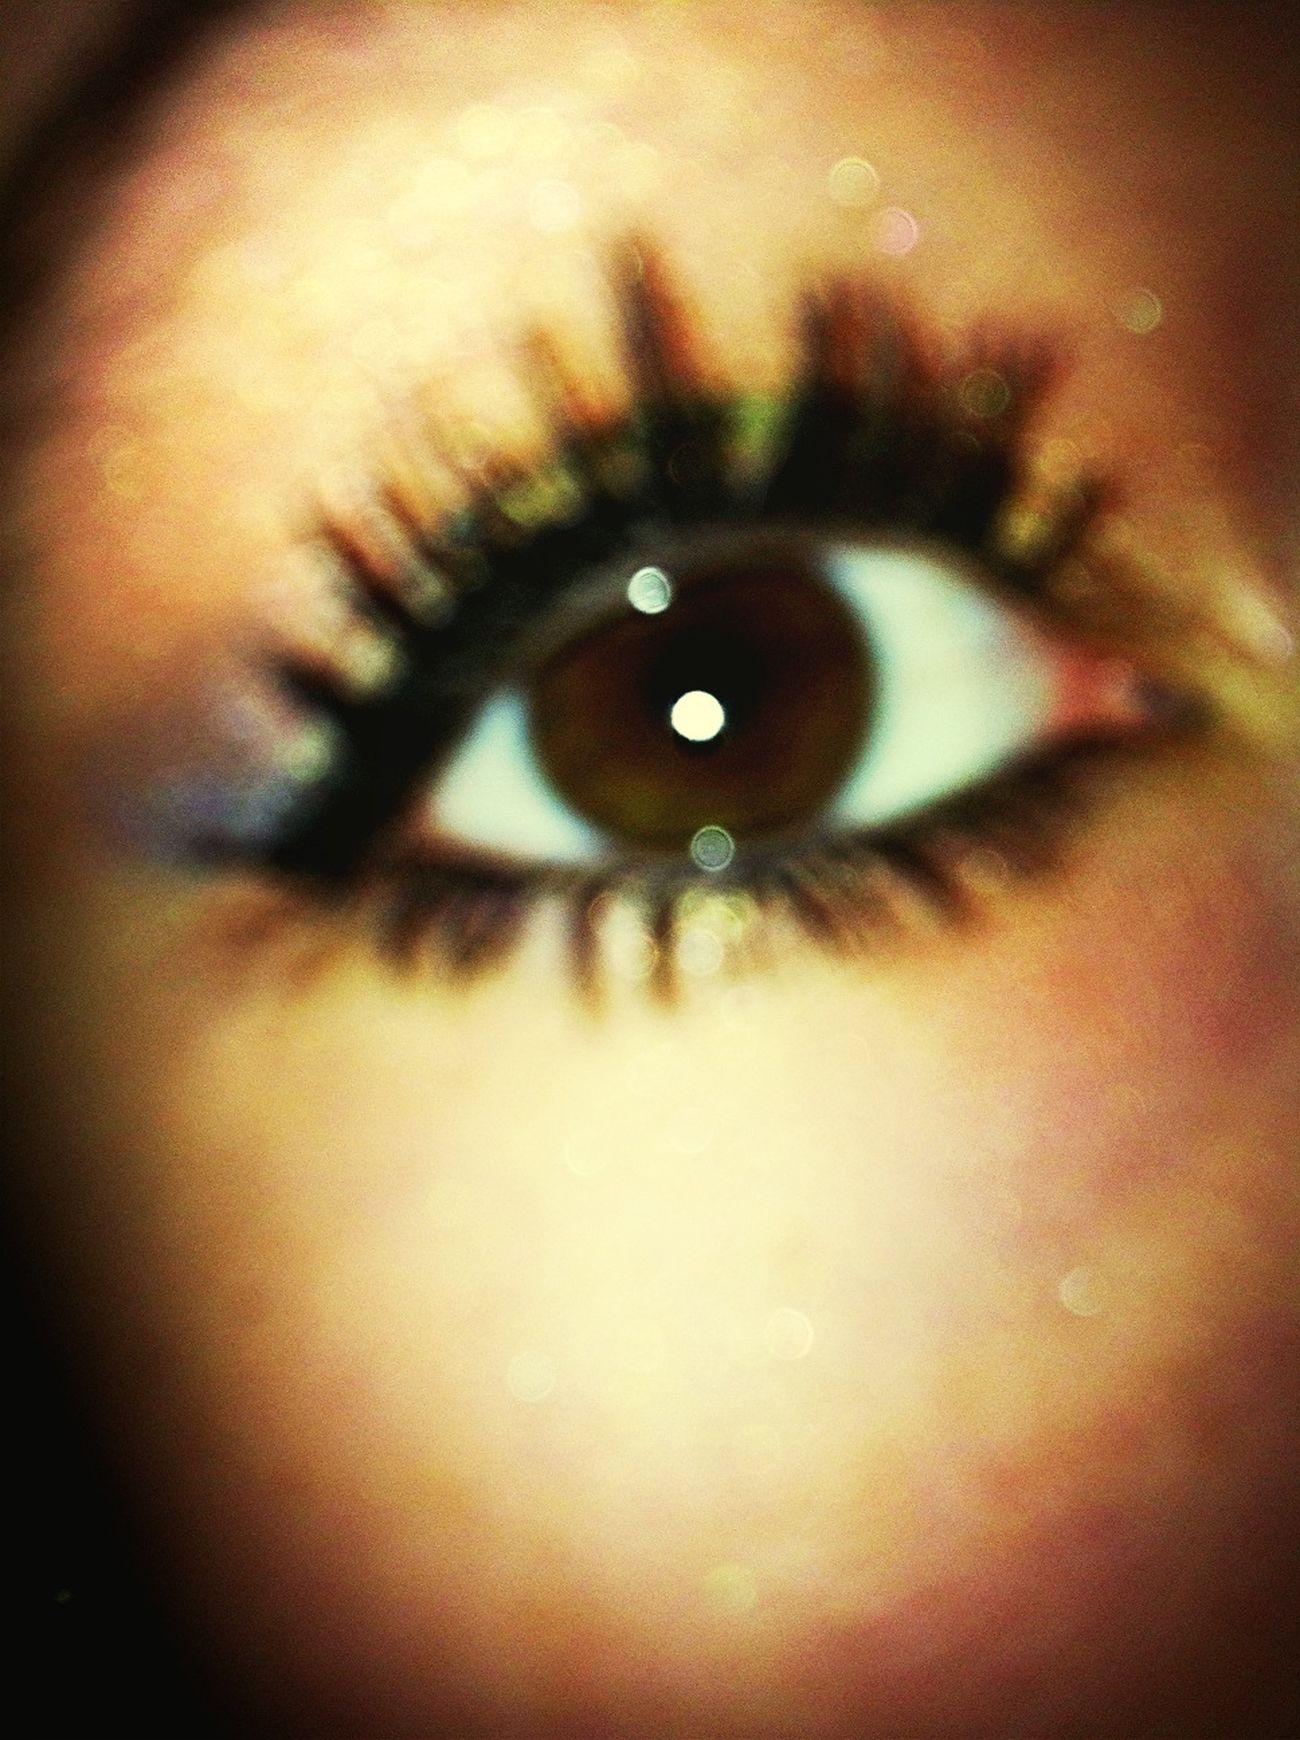 My Eye Pretty Makeup Eye Shadow Love It